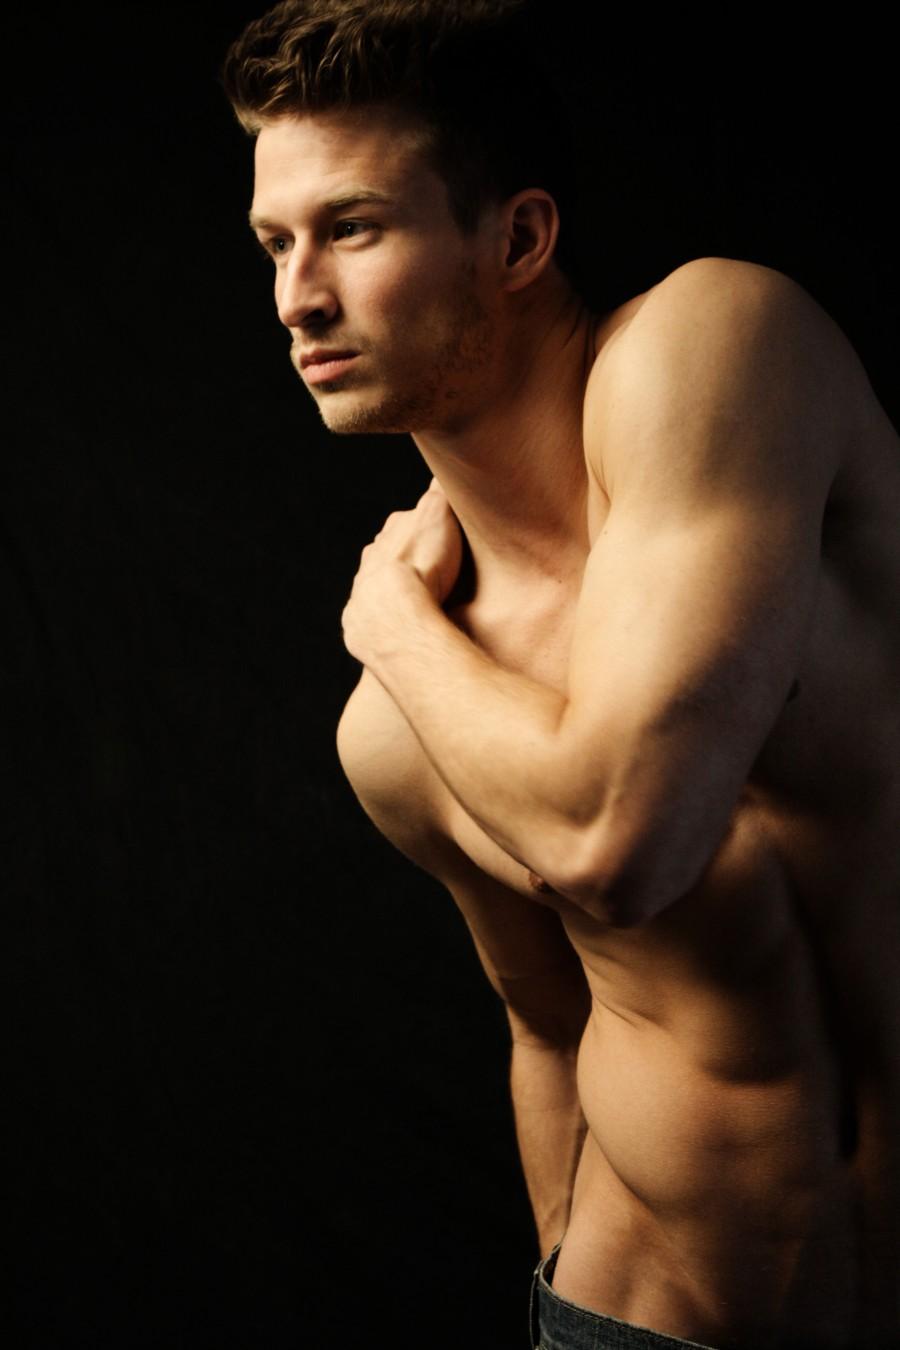 Adam Huber - Page 3 - Male Fashion Models - Bellazon-2269